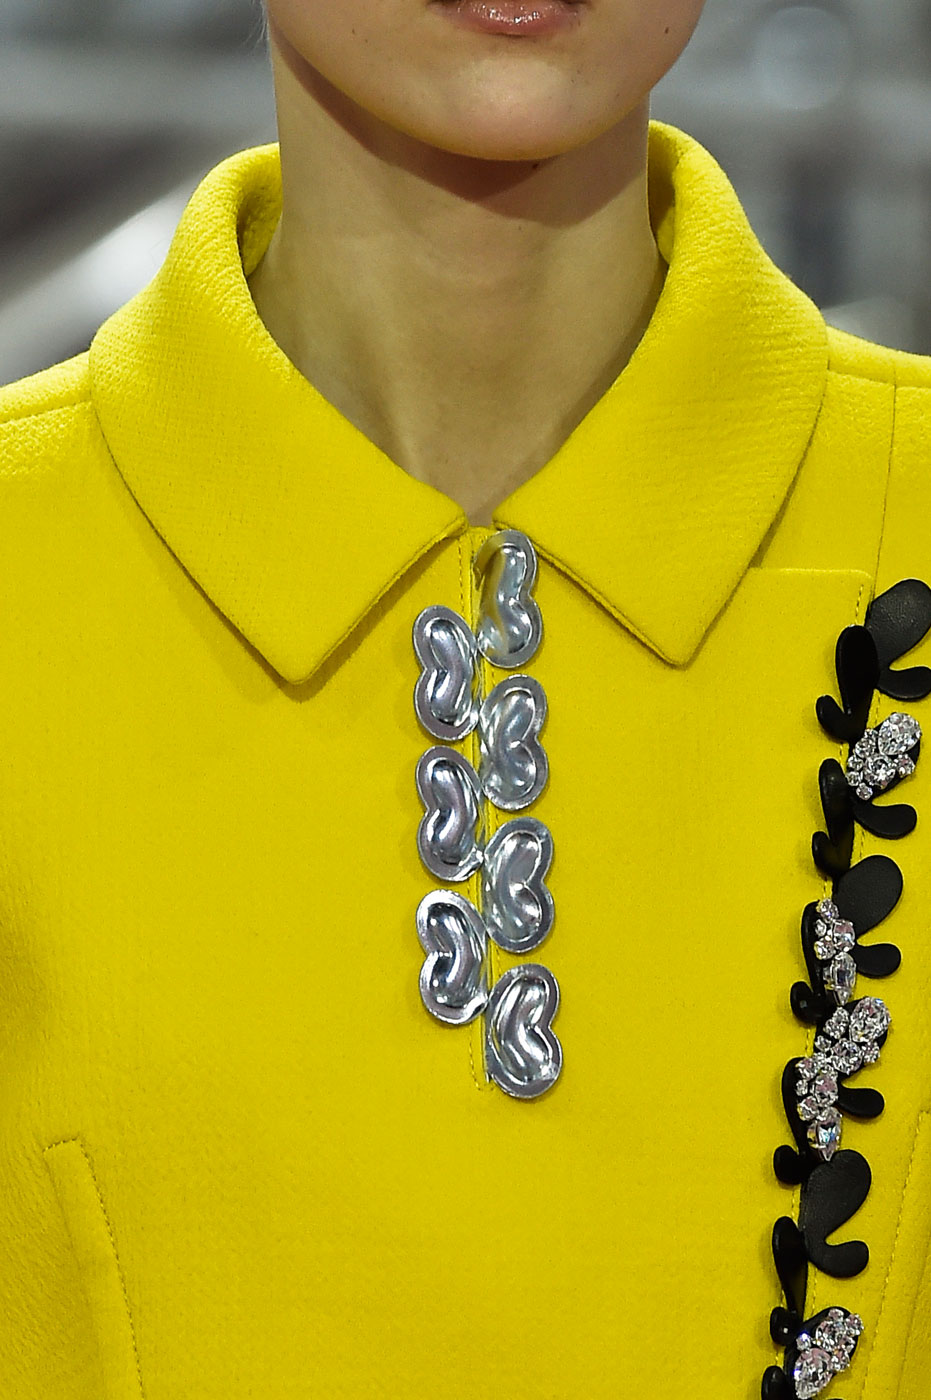 Christian-Dior-fashion-runway-show-close-ups-haute-couture-paris-spring-summer-2015-the-impression-134